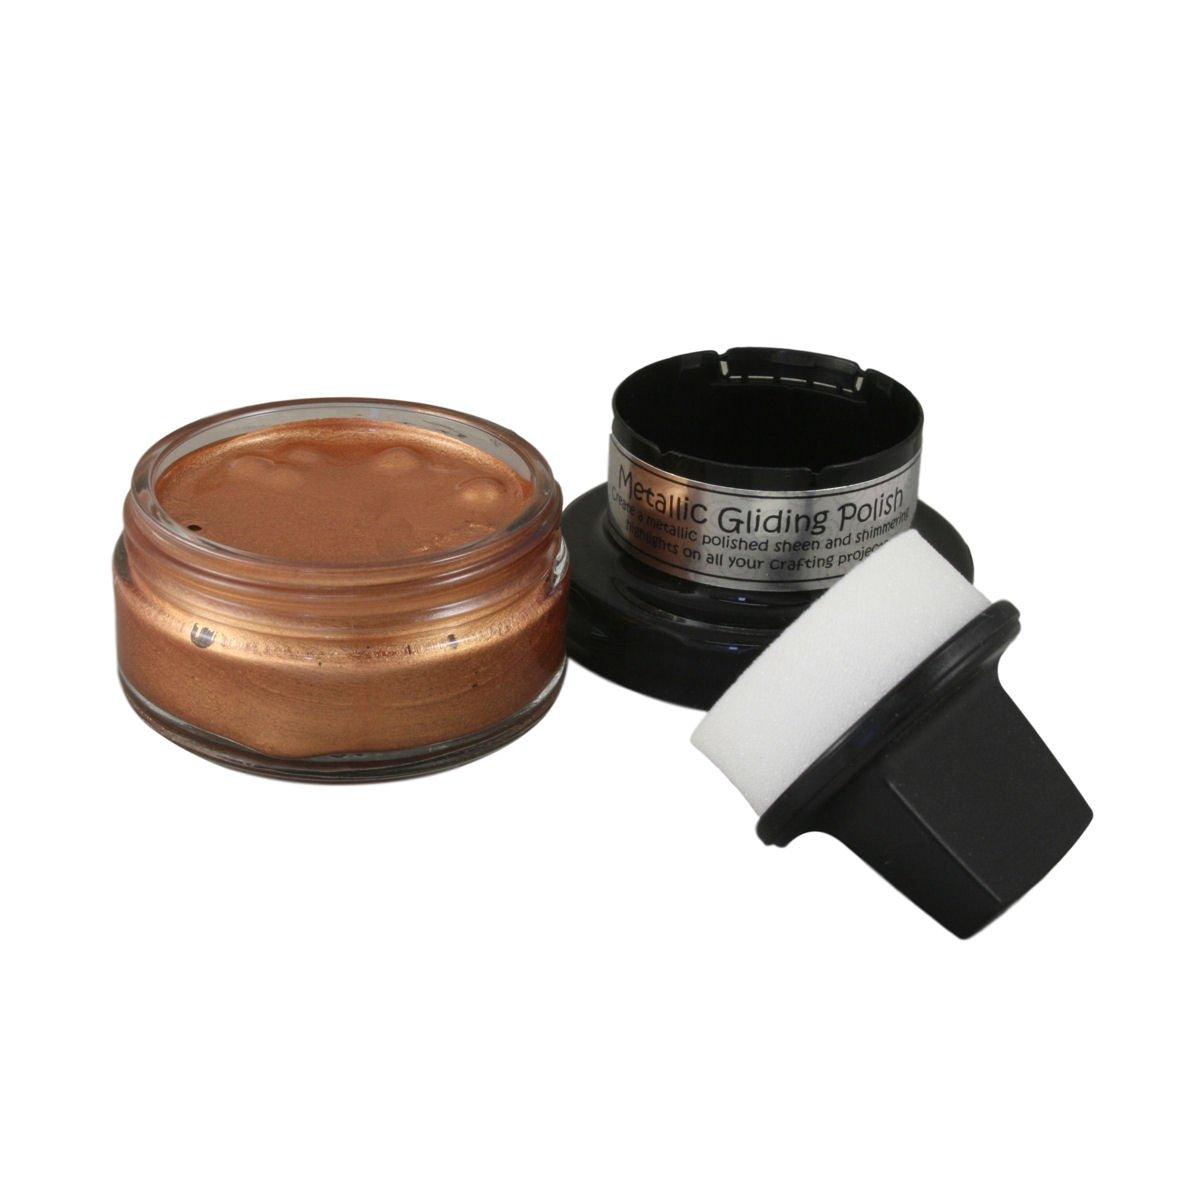 Cosmic Shimmer Metallic Vergoldung Nagellack, Acryl, Kupfer Glanz, 7,5x 6,2x 6,2cm 5x 6 2x 6 2cm Creative Expressions